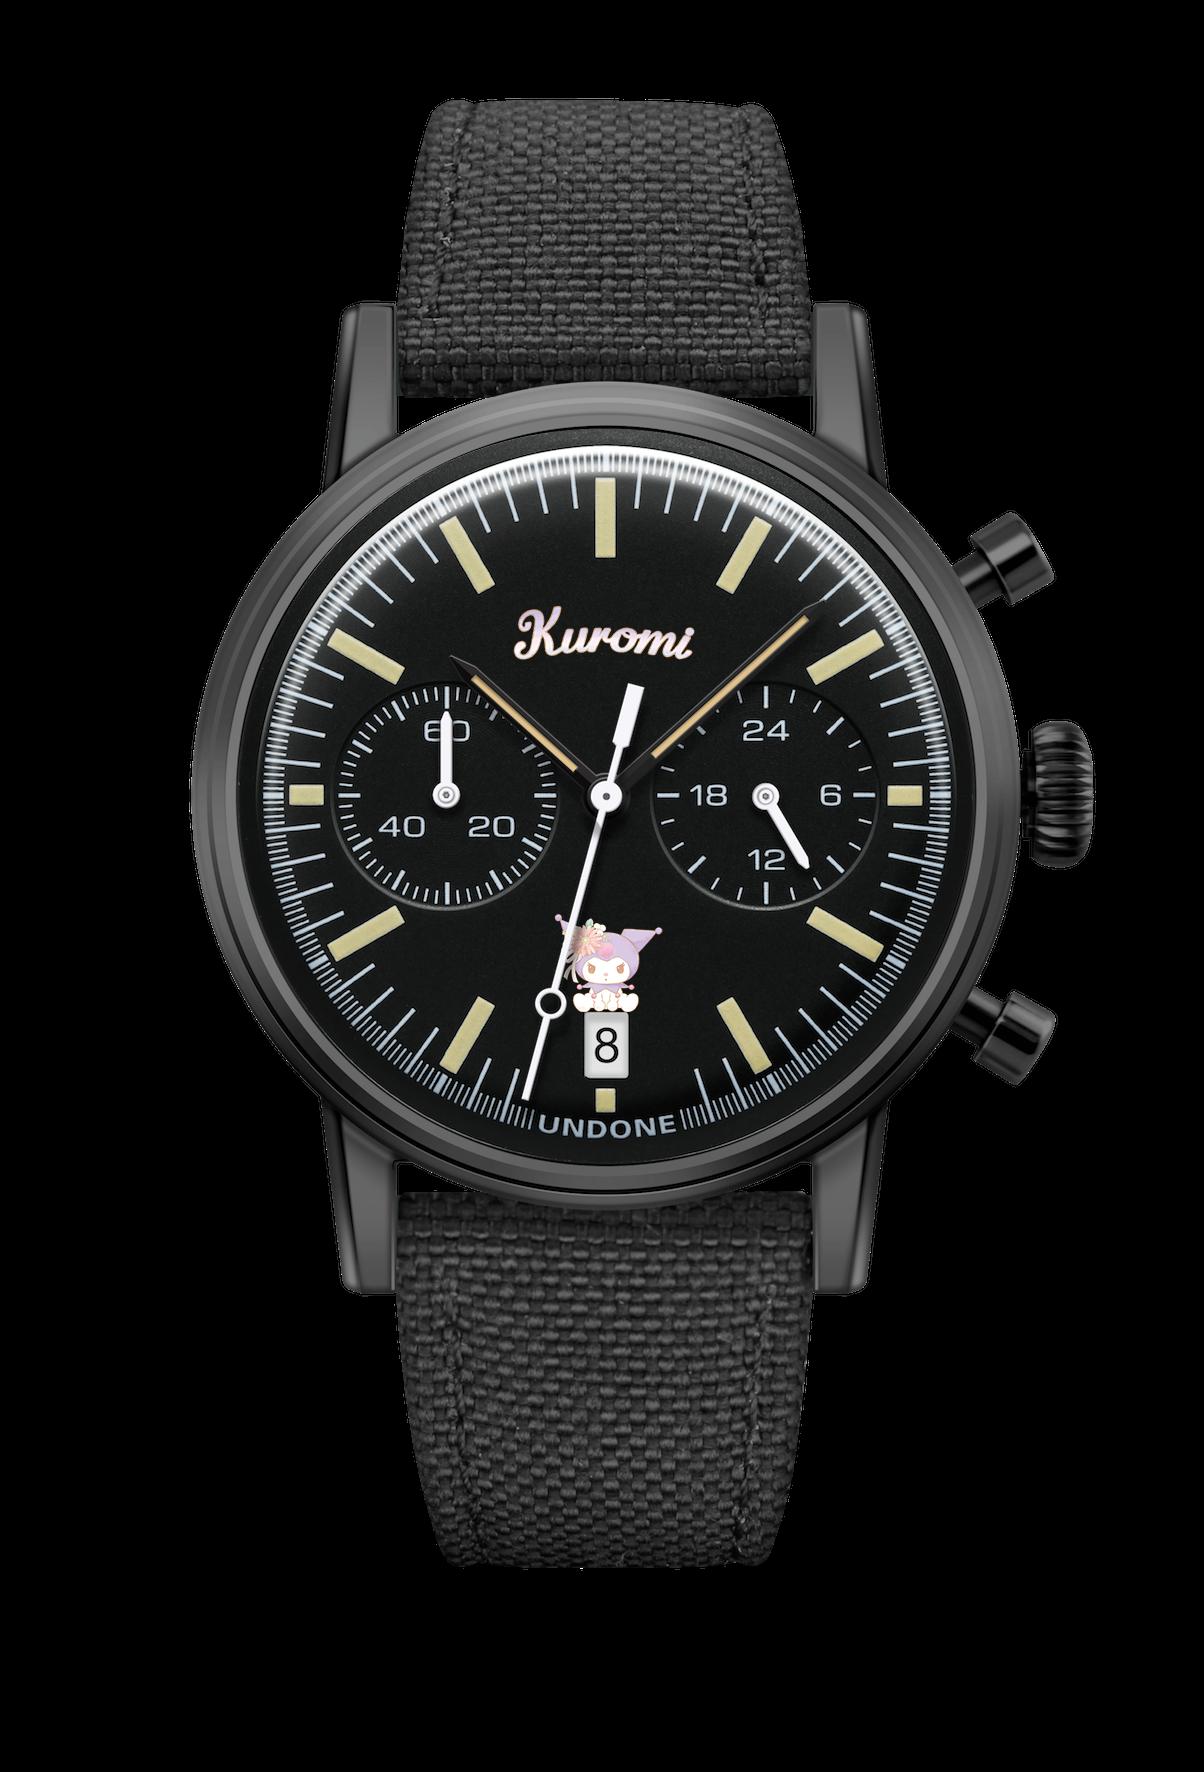 UNDONE サンリオ 腕時計 クロミkuromi_front